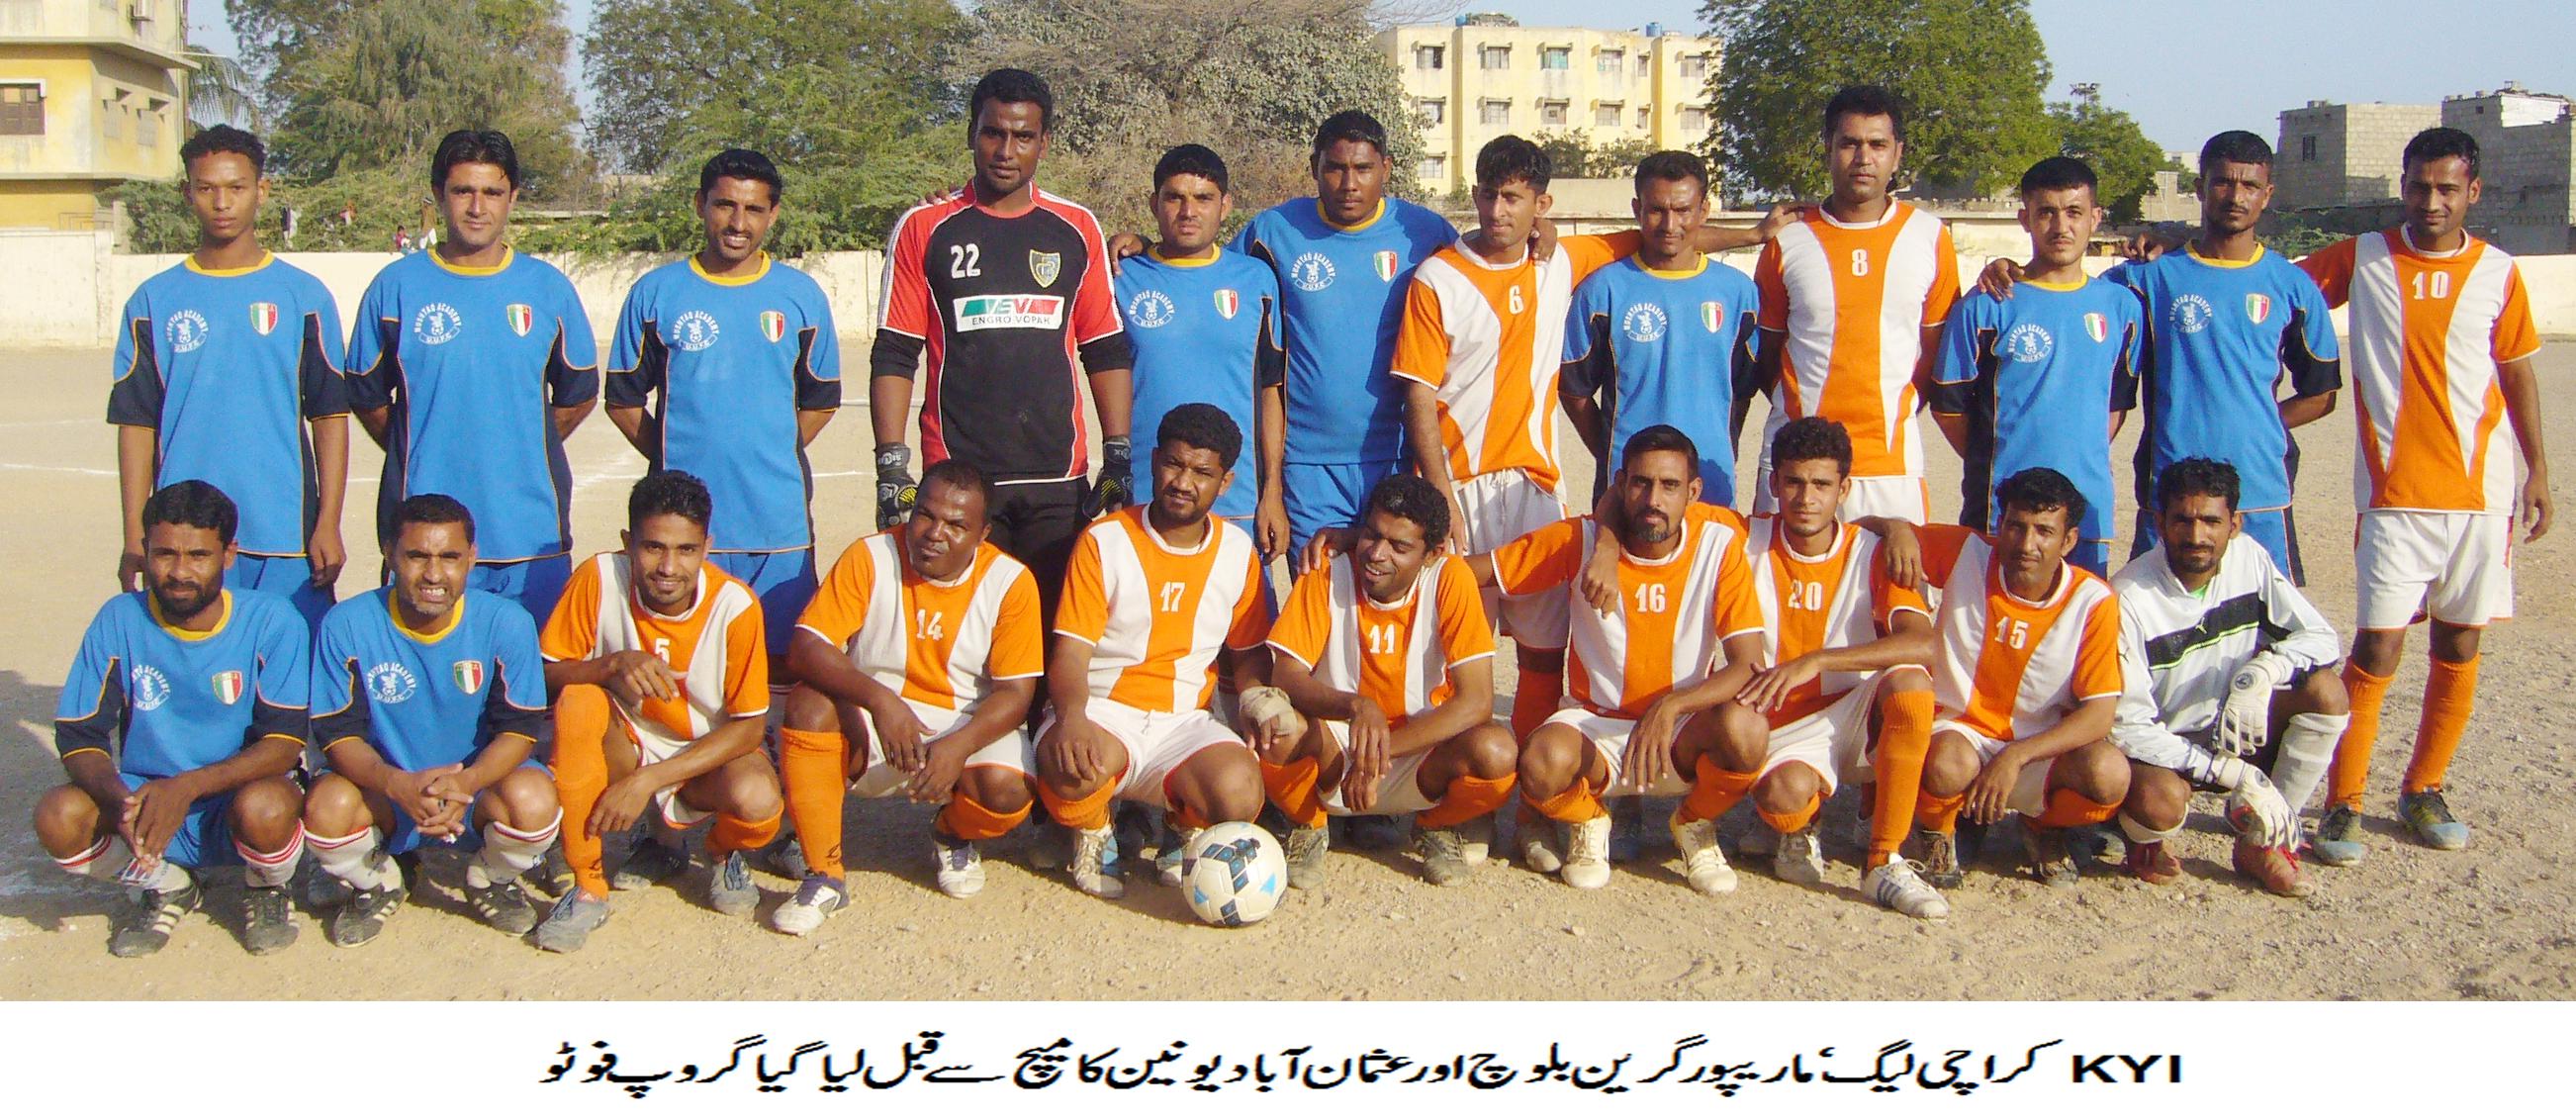 KYI COCA COLA KARACHI LEAGUE 2014: Mauripur Green Baloch thrash Usmanabad Union